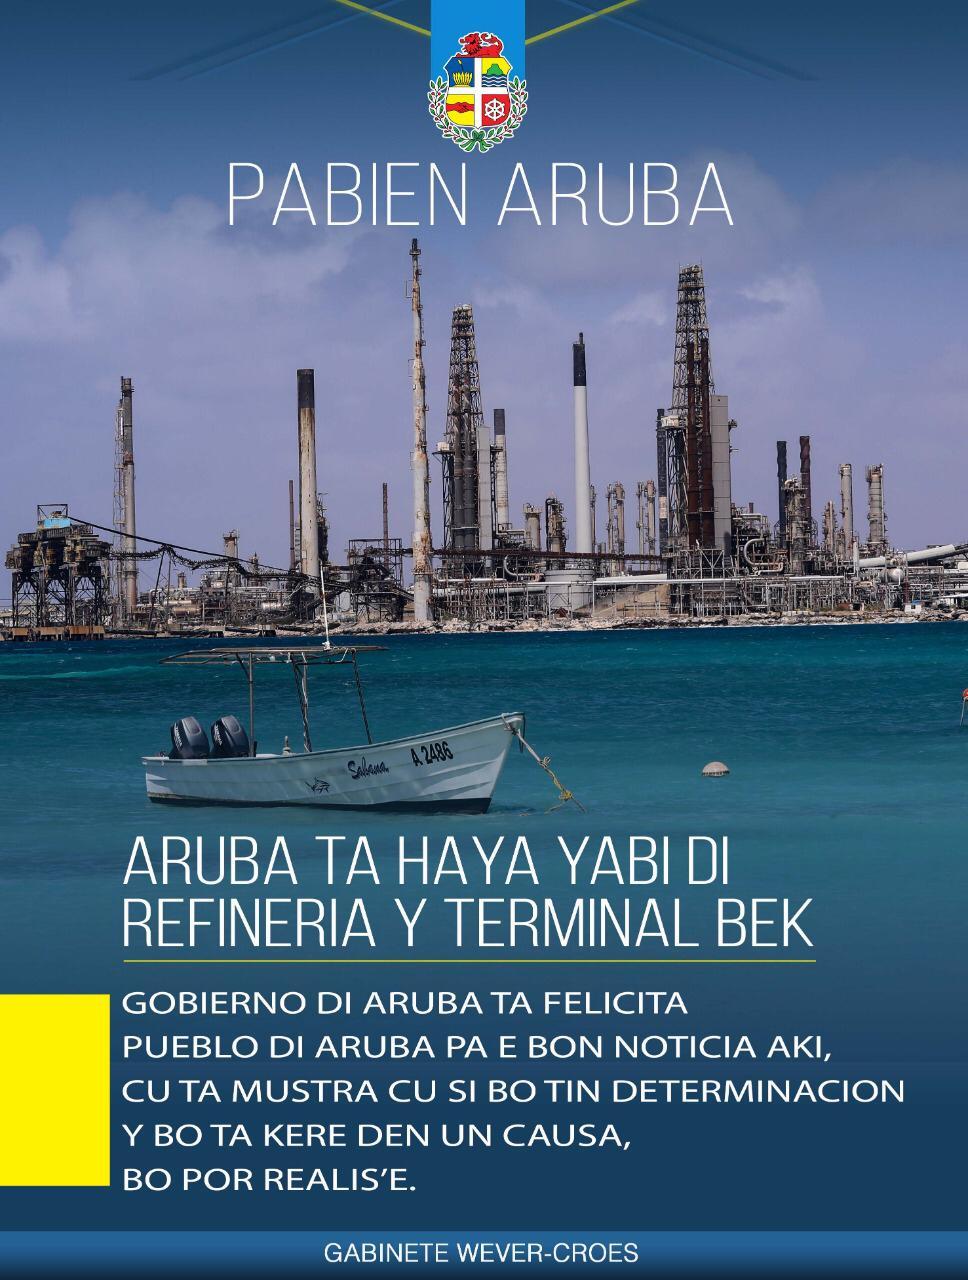 ARUBA TA HAÑA YABI DI REFINERIA I TÈRMINAL BÈK